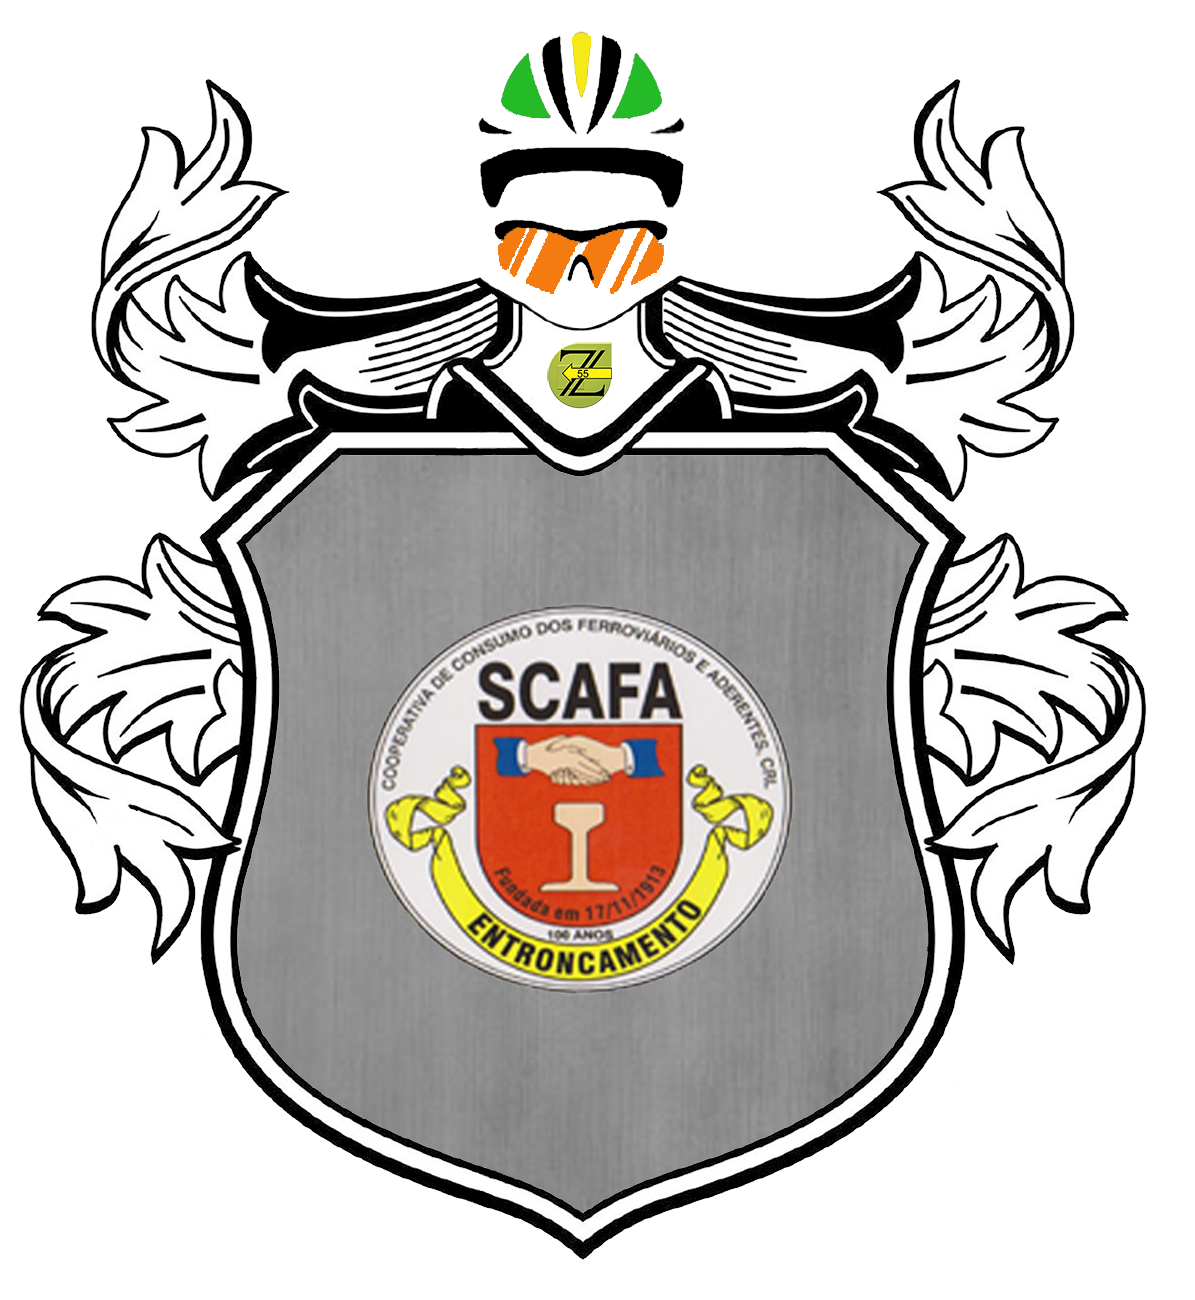 SCAFA